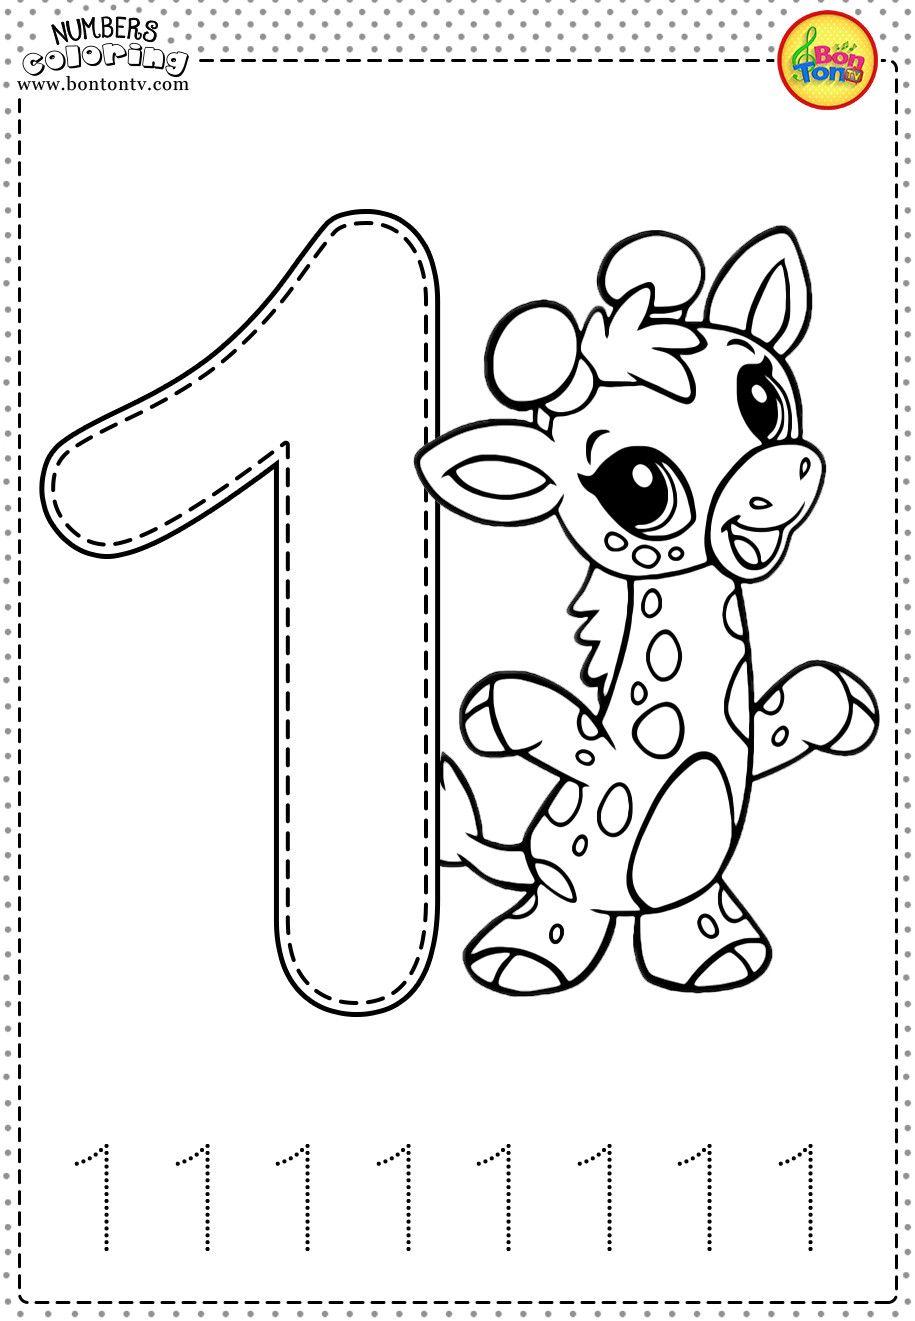 2 Letter D Coloring Worksheet Printable Number 1 Preschool Printables Free In 2020 Free Preschool Printables Preschool Worksheets Free Printables Kids Learning Numbers